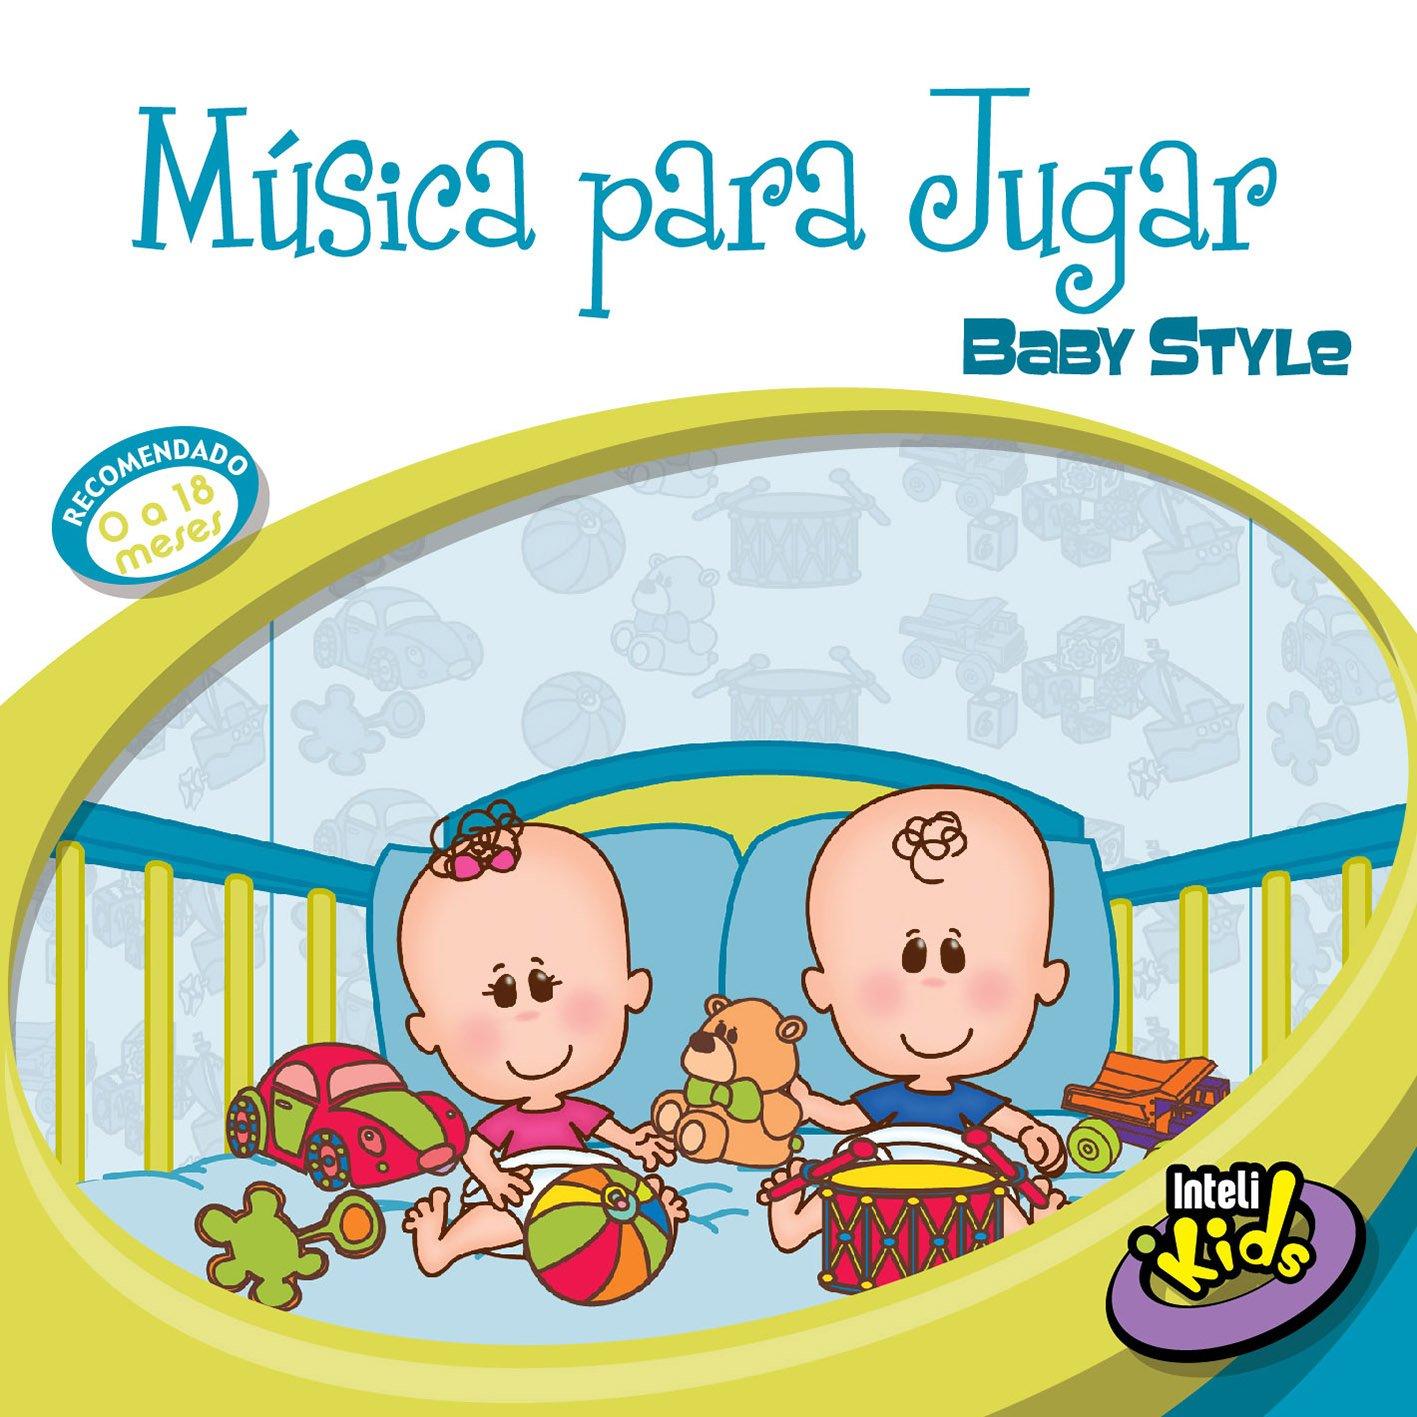 Musicaparajugar-Intelikids - Musica Para Jugar: Baby Style - Amazon.com Music